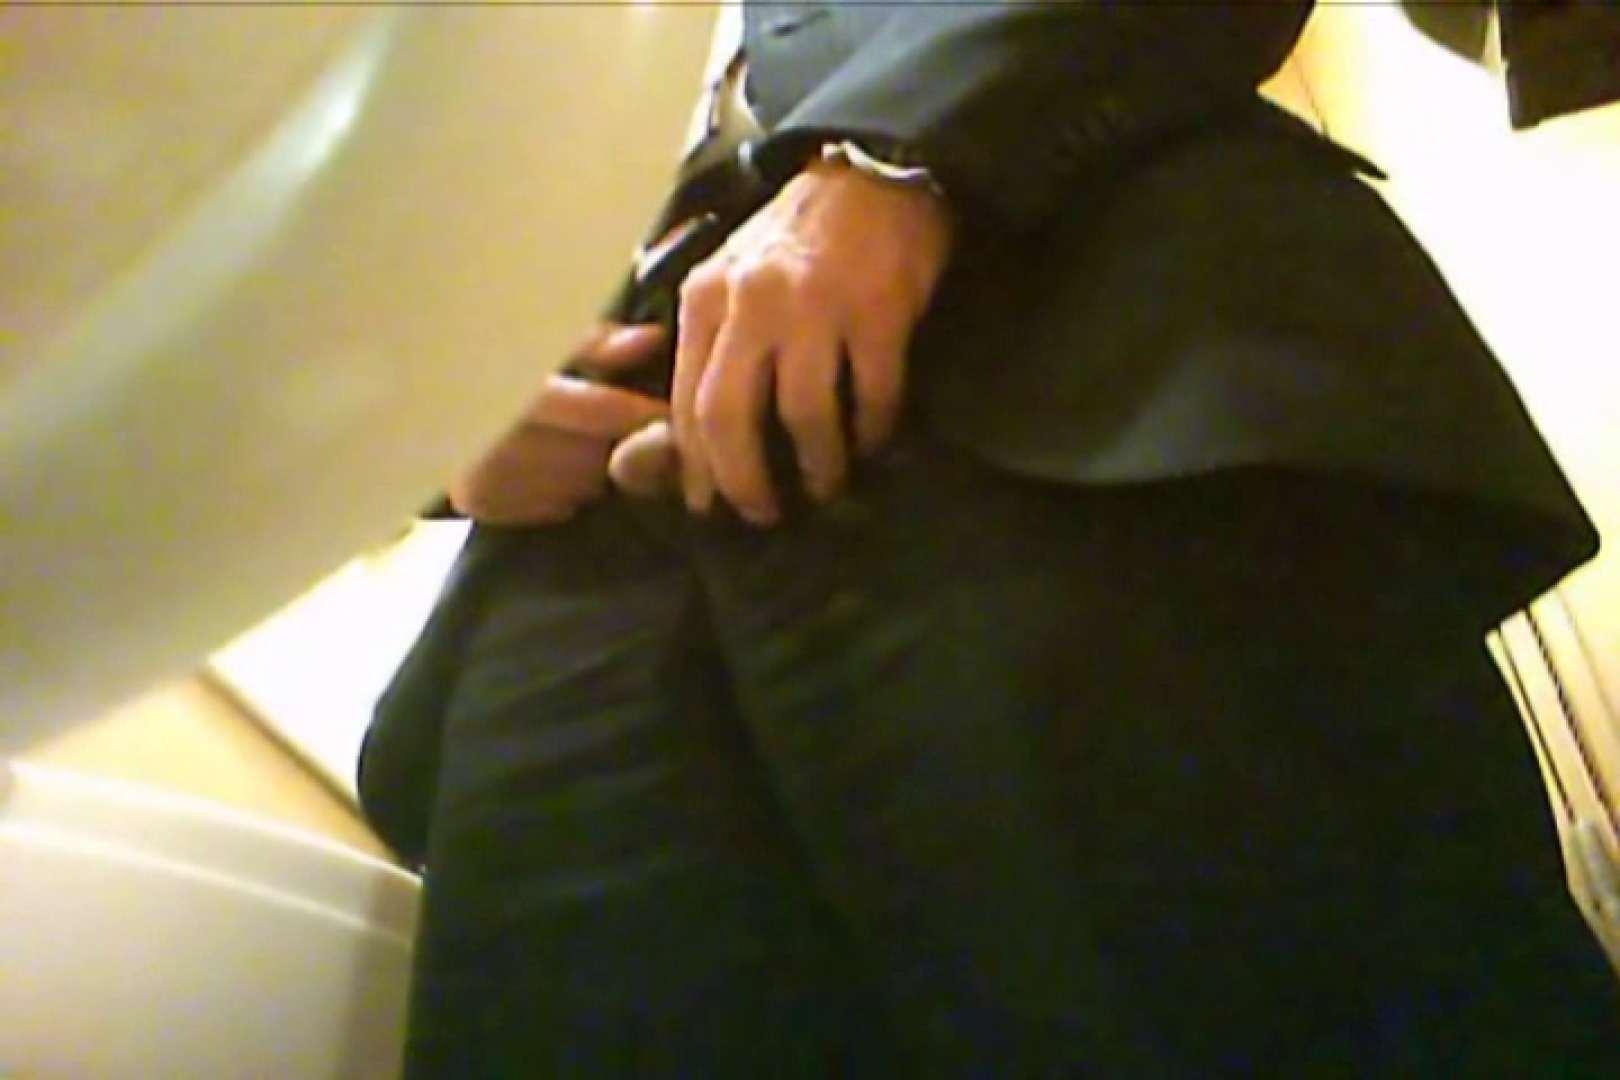 SEASON 2ND!掴み取りさんの洗面所覗き!in新幹線!VOL.22 おやじ熊系ボーイズ | ボーイズ私服  71pic 29